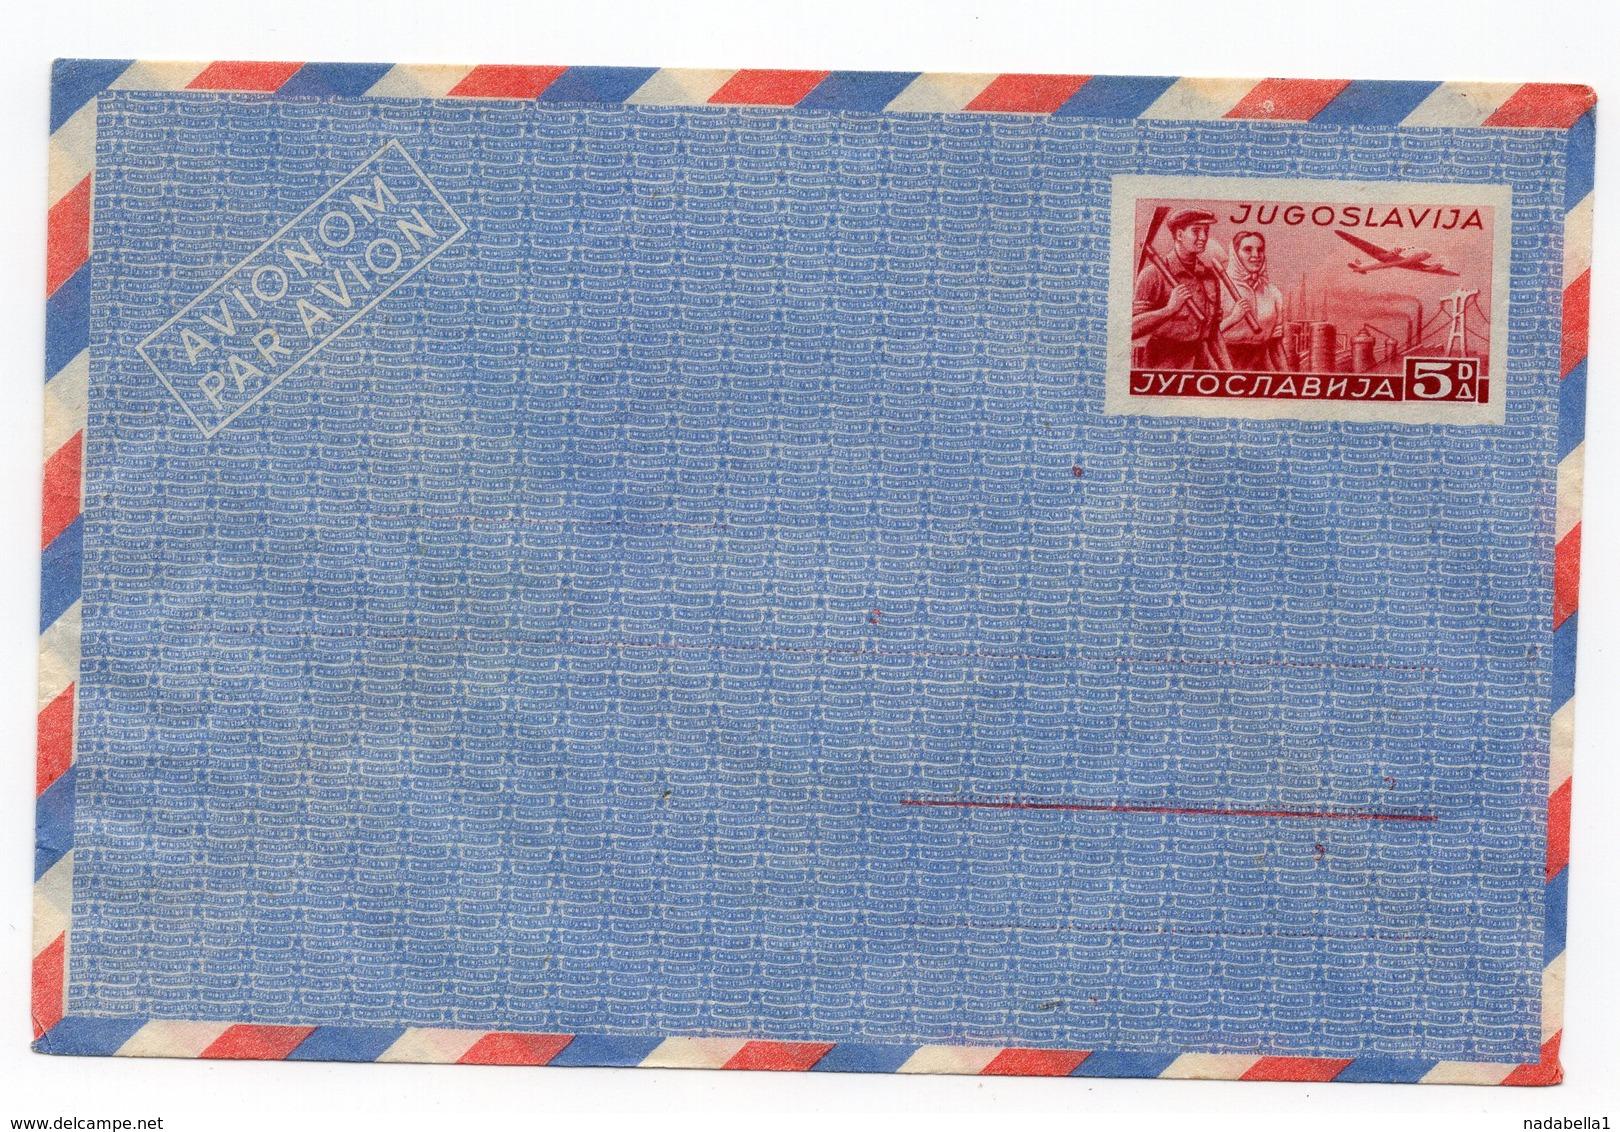 1940s 50s FNR YUGOSLAVIA, STAMP IMPRINTED COVER, POSTAL STATIONERY - Postal Stationery